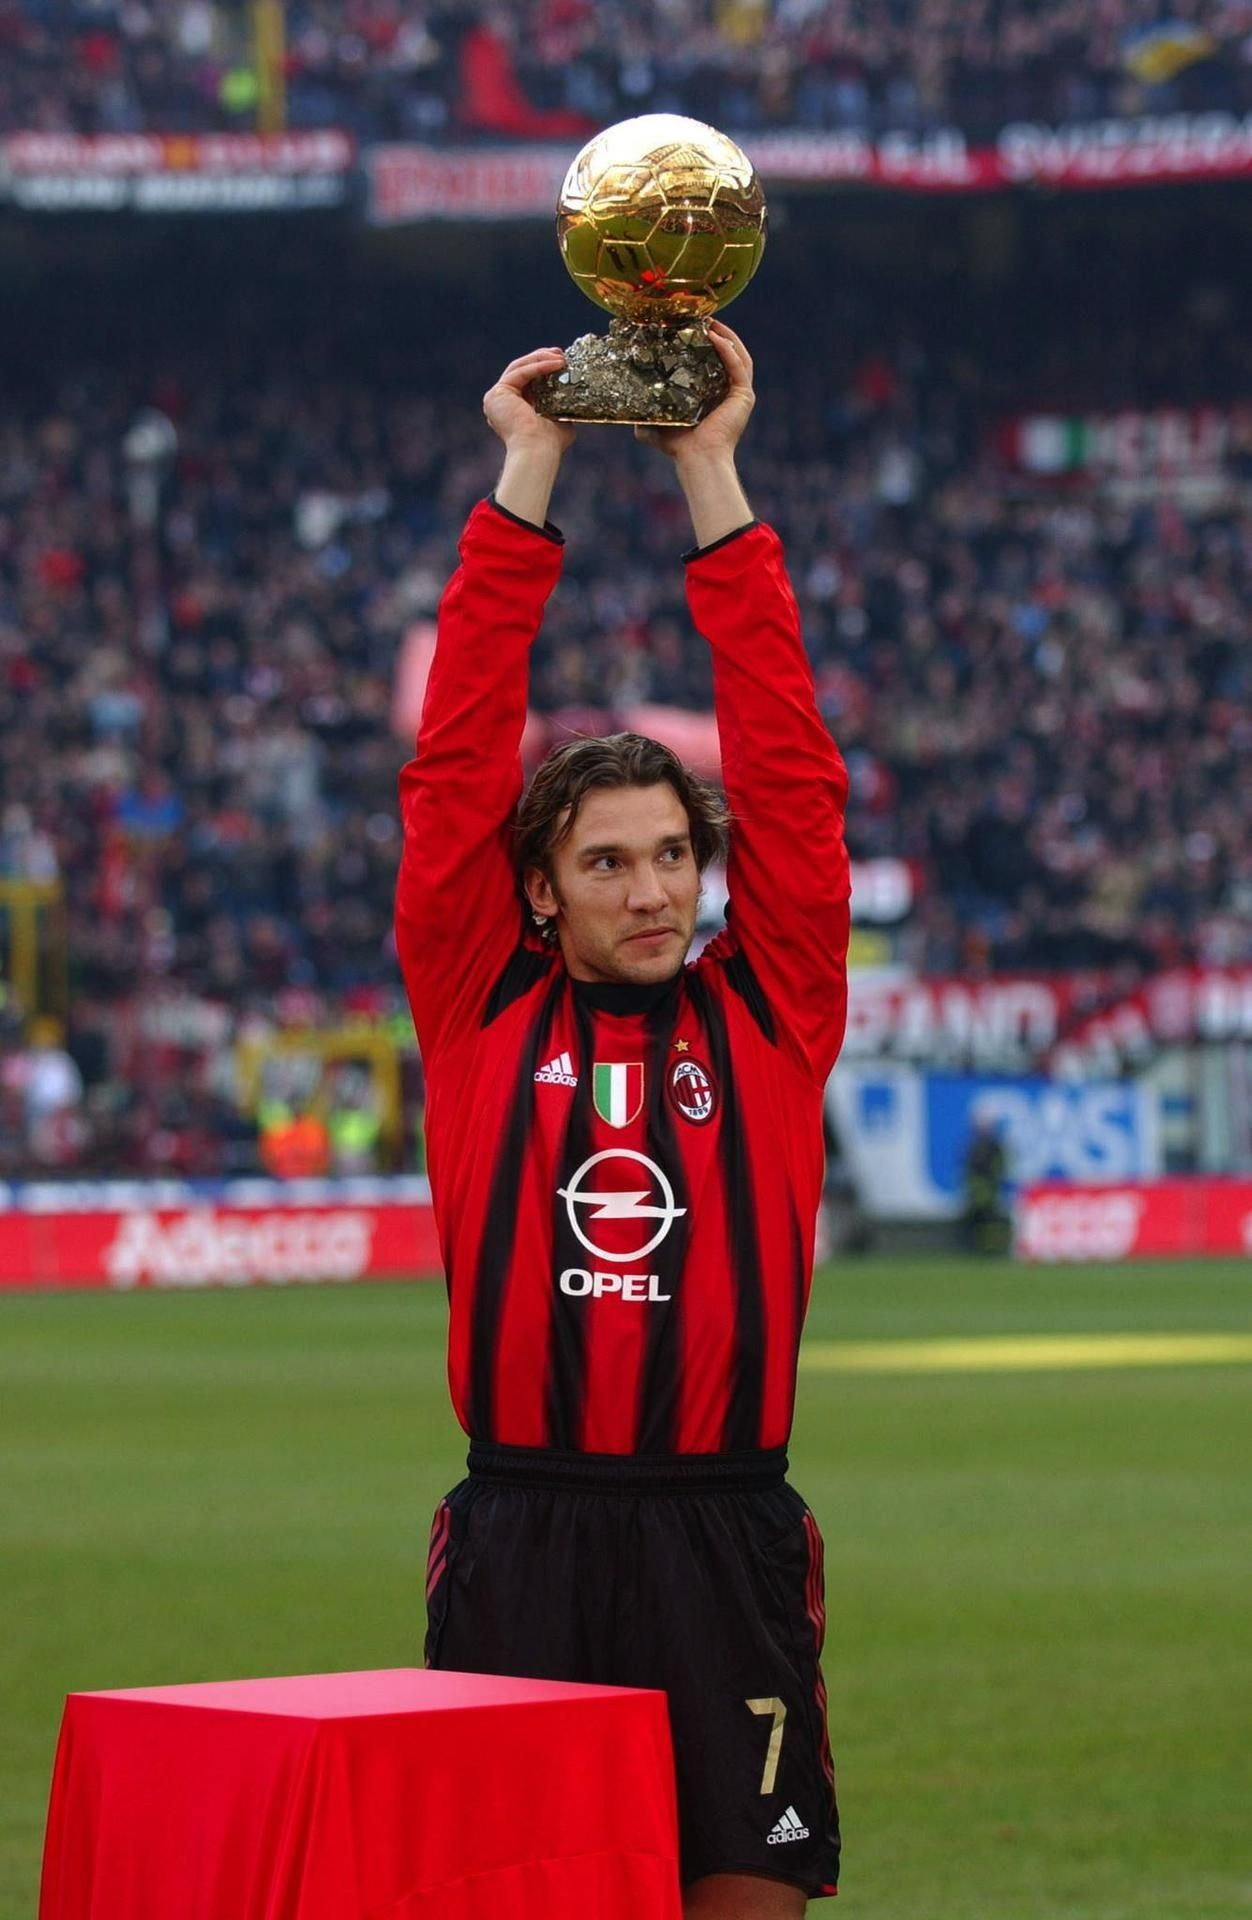 67517caa10d21a Andriy Shevchenko ballon d'or 2004 | bóng đá | Milan football, Ac ...